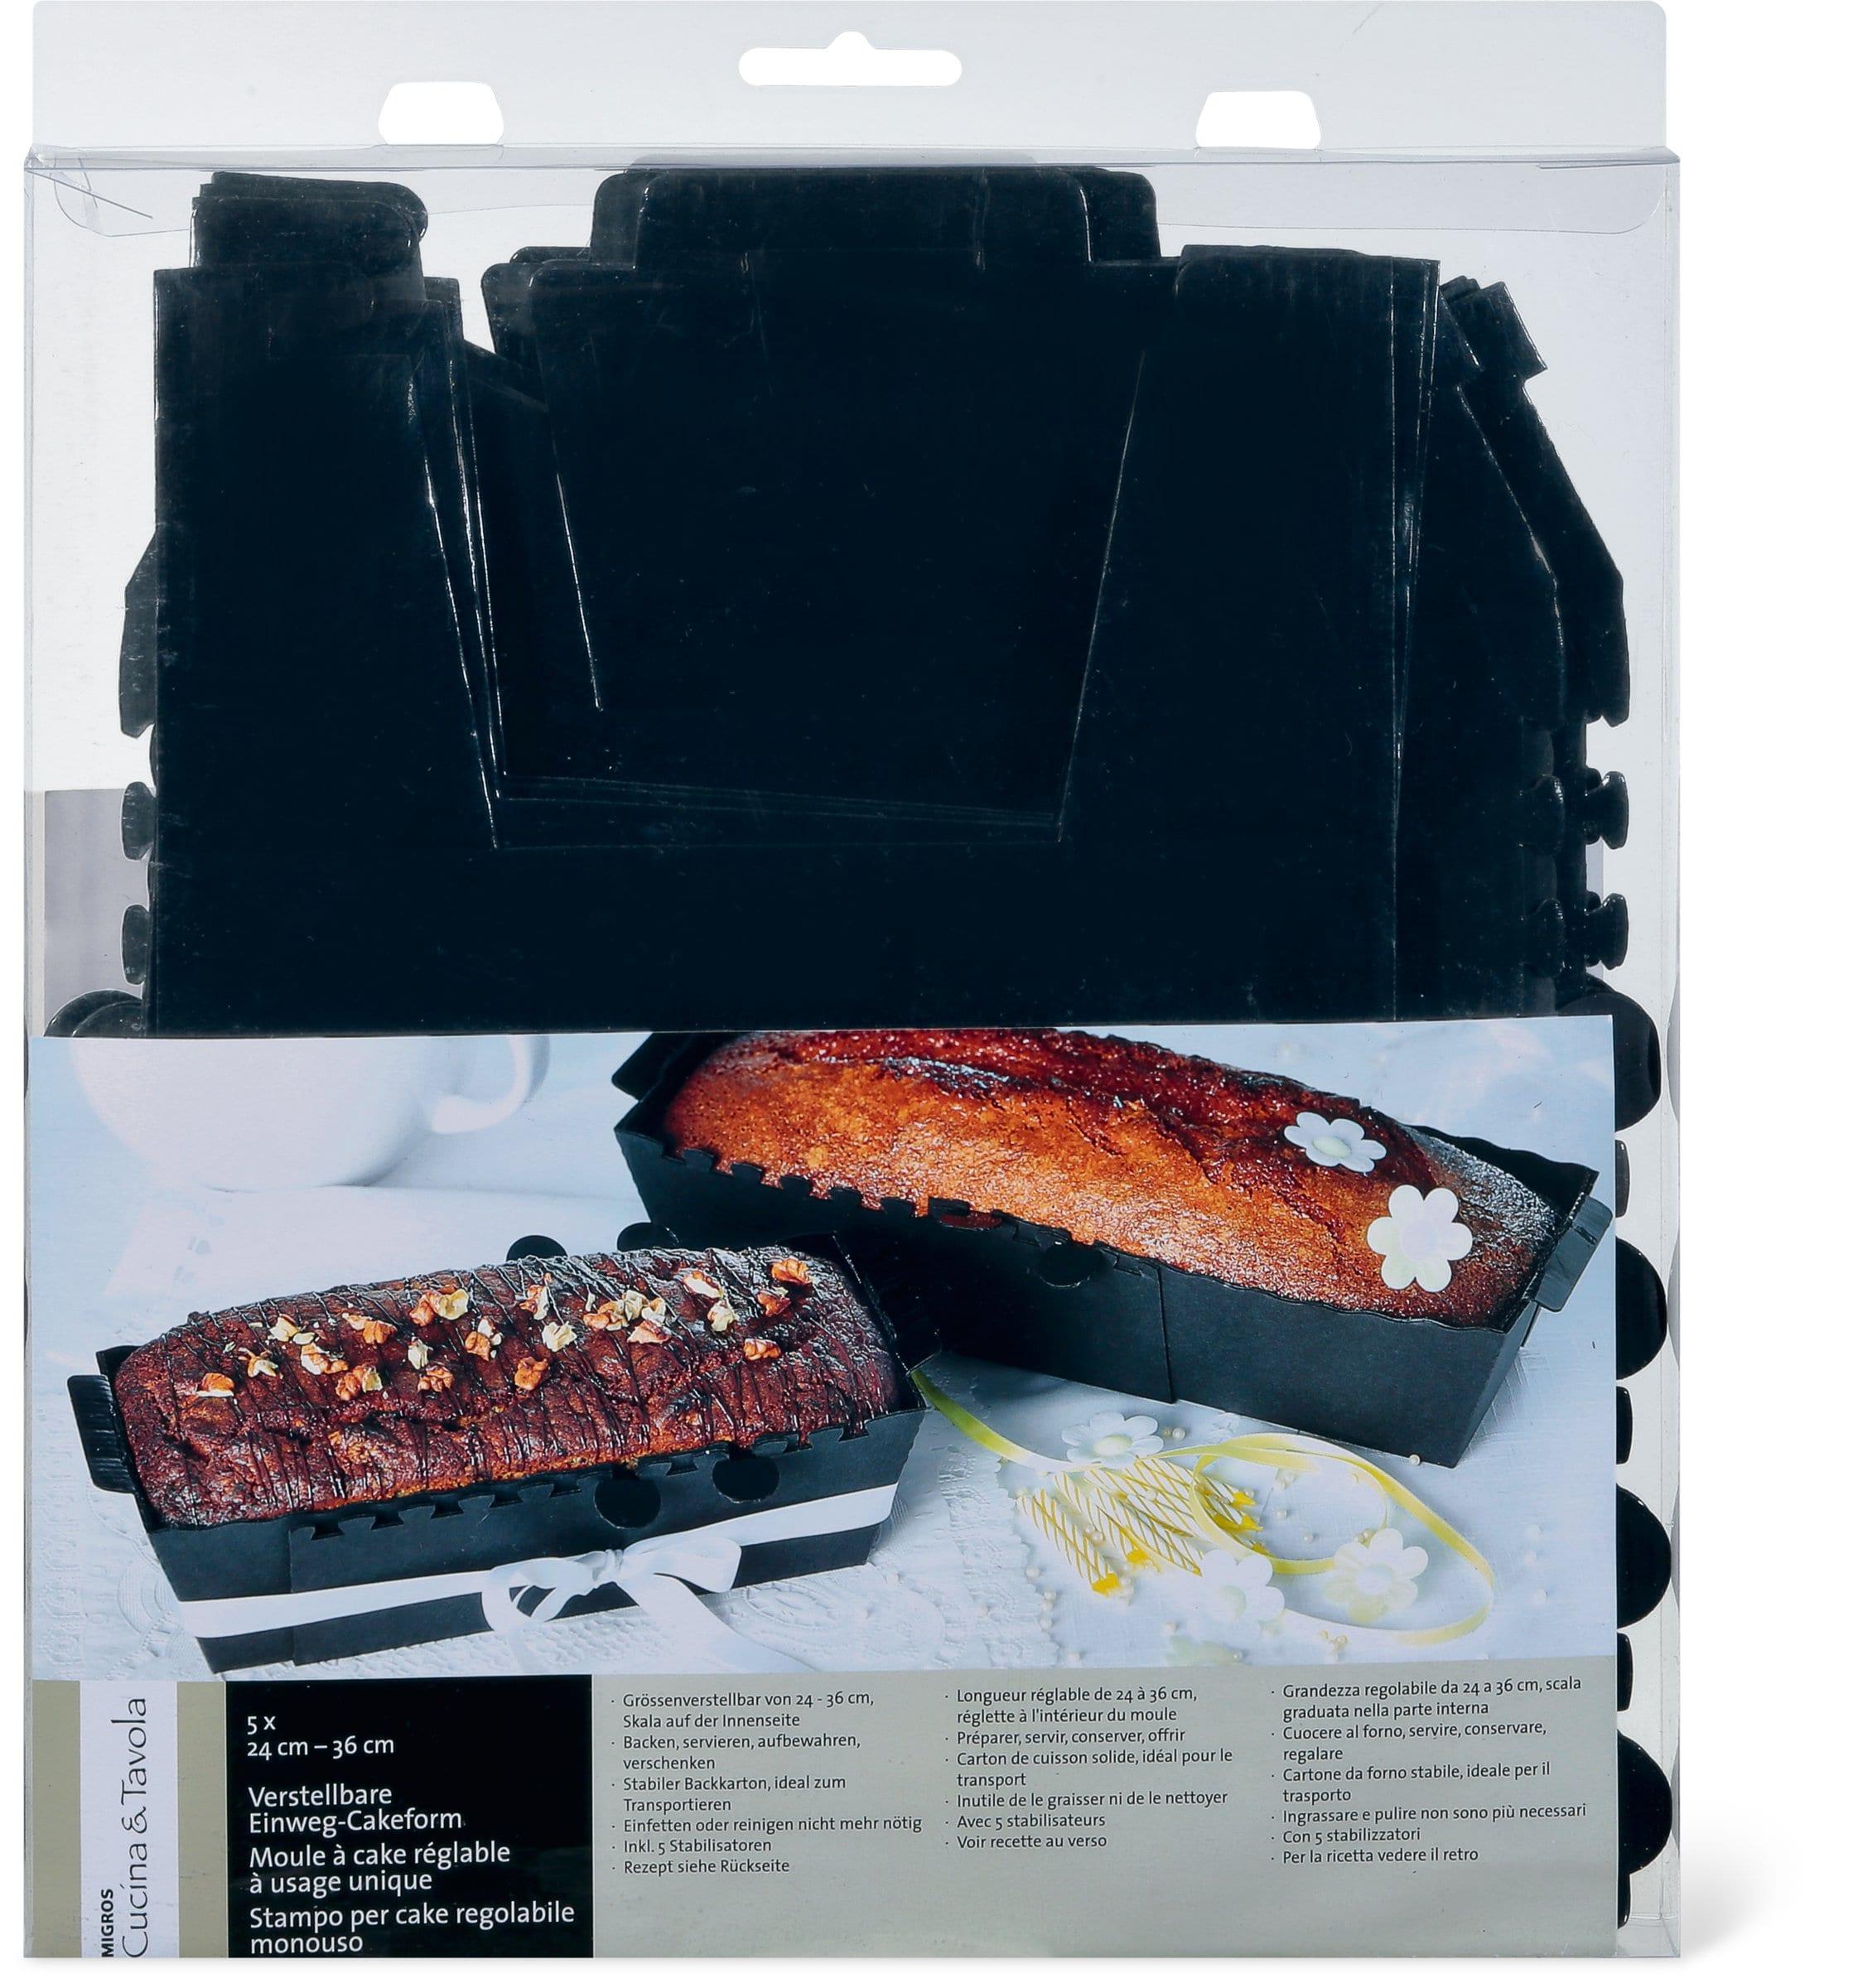 Cucina & Tavola CUCINA & TAVOLA Verstellbare Einweg-Cakeform